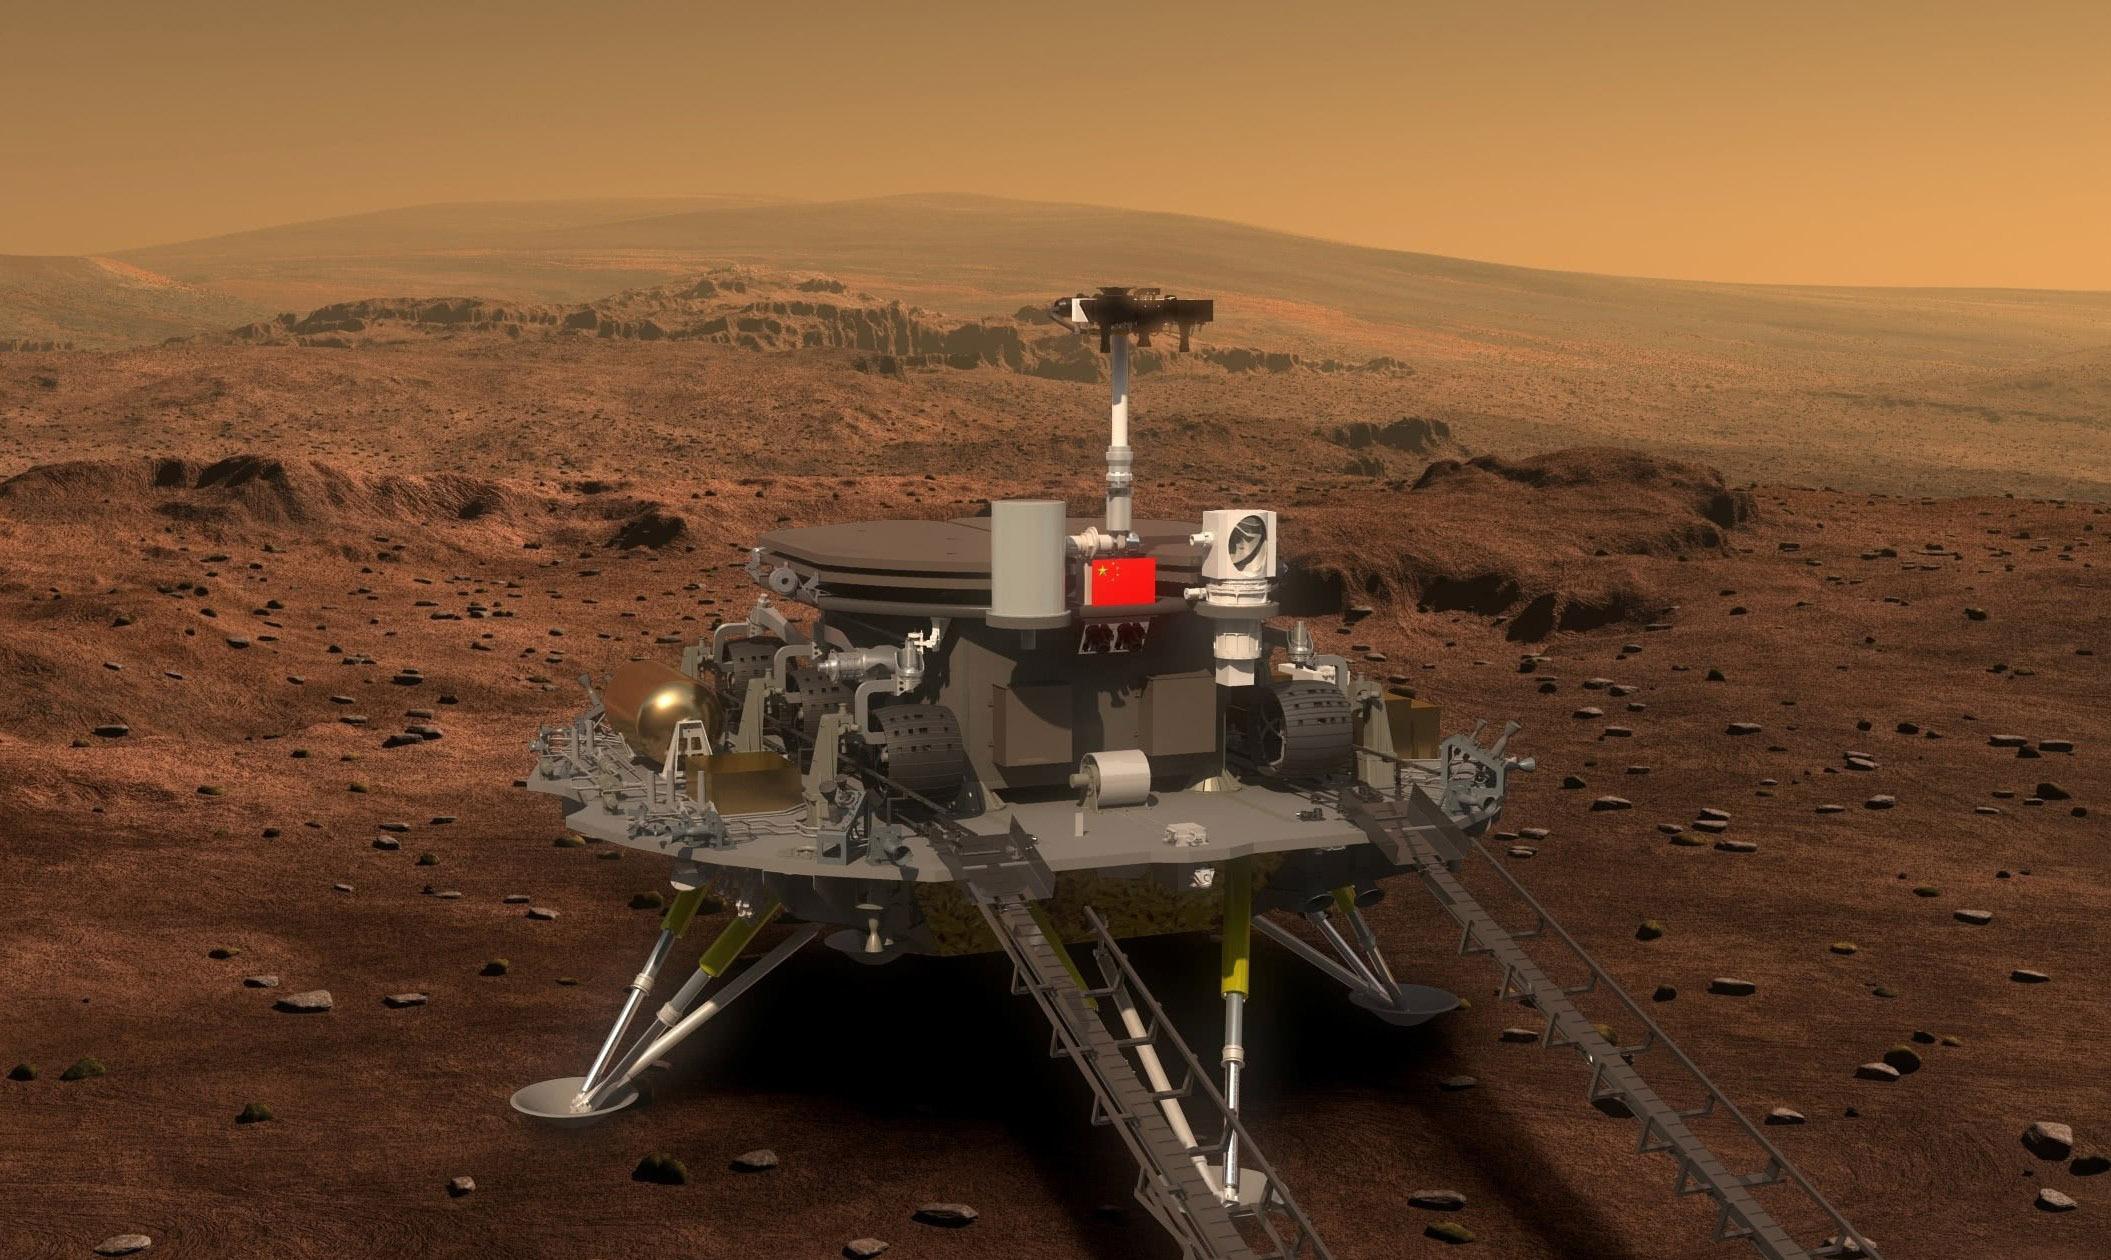 spacecraft on mars 2018 - photo #16